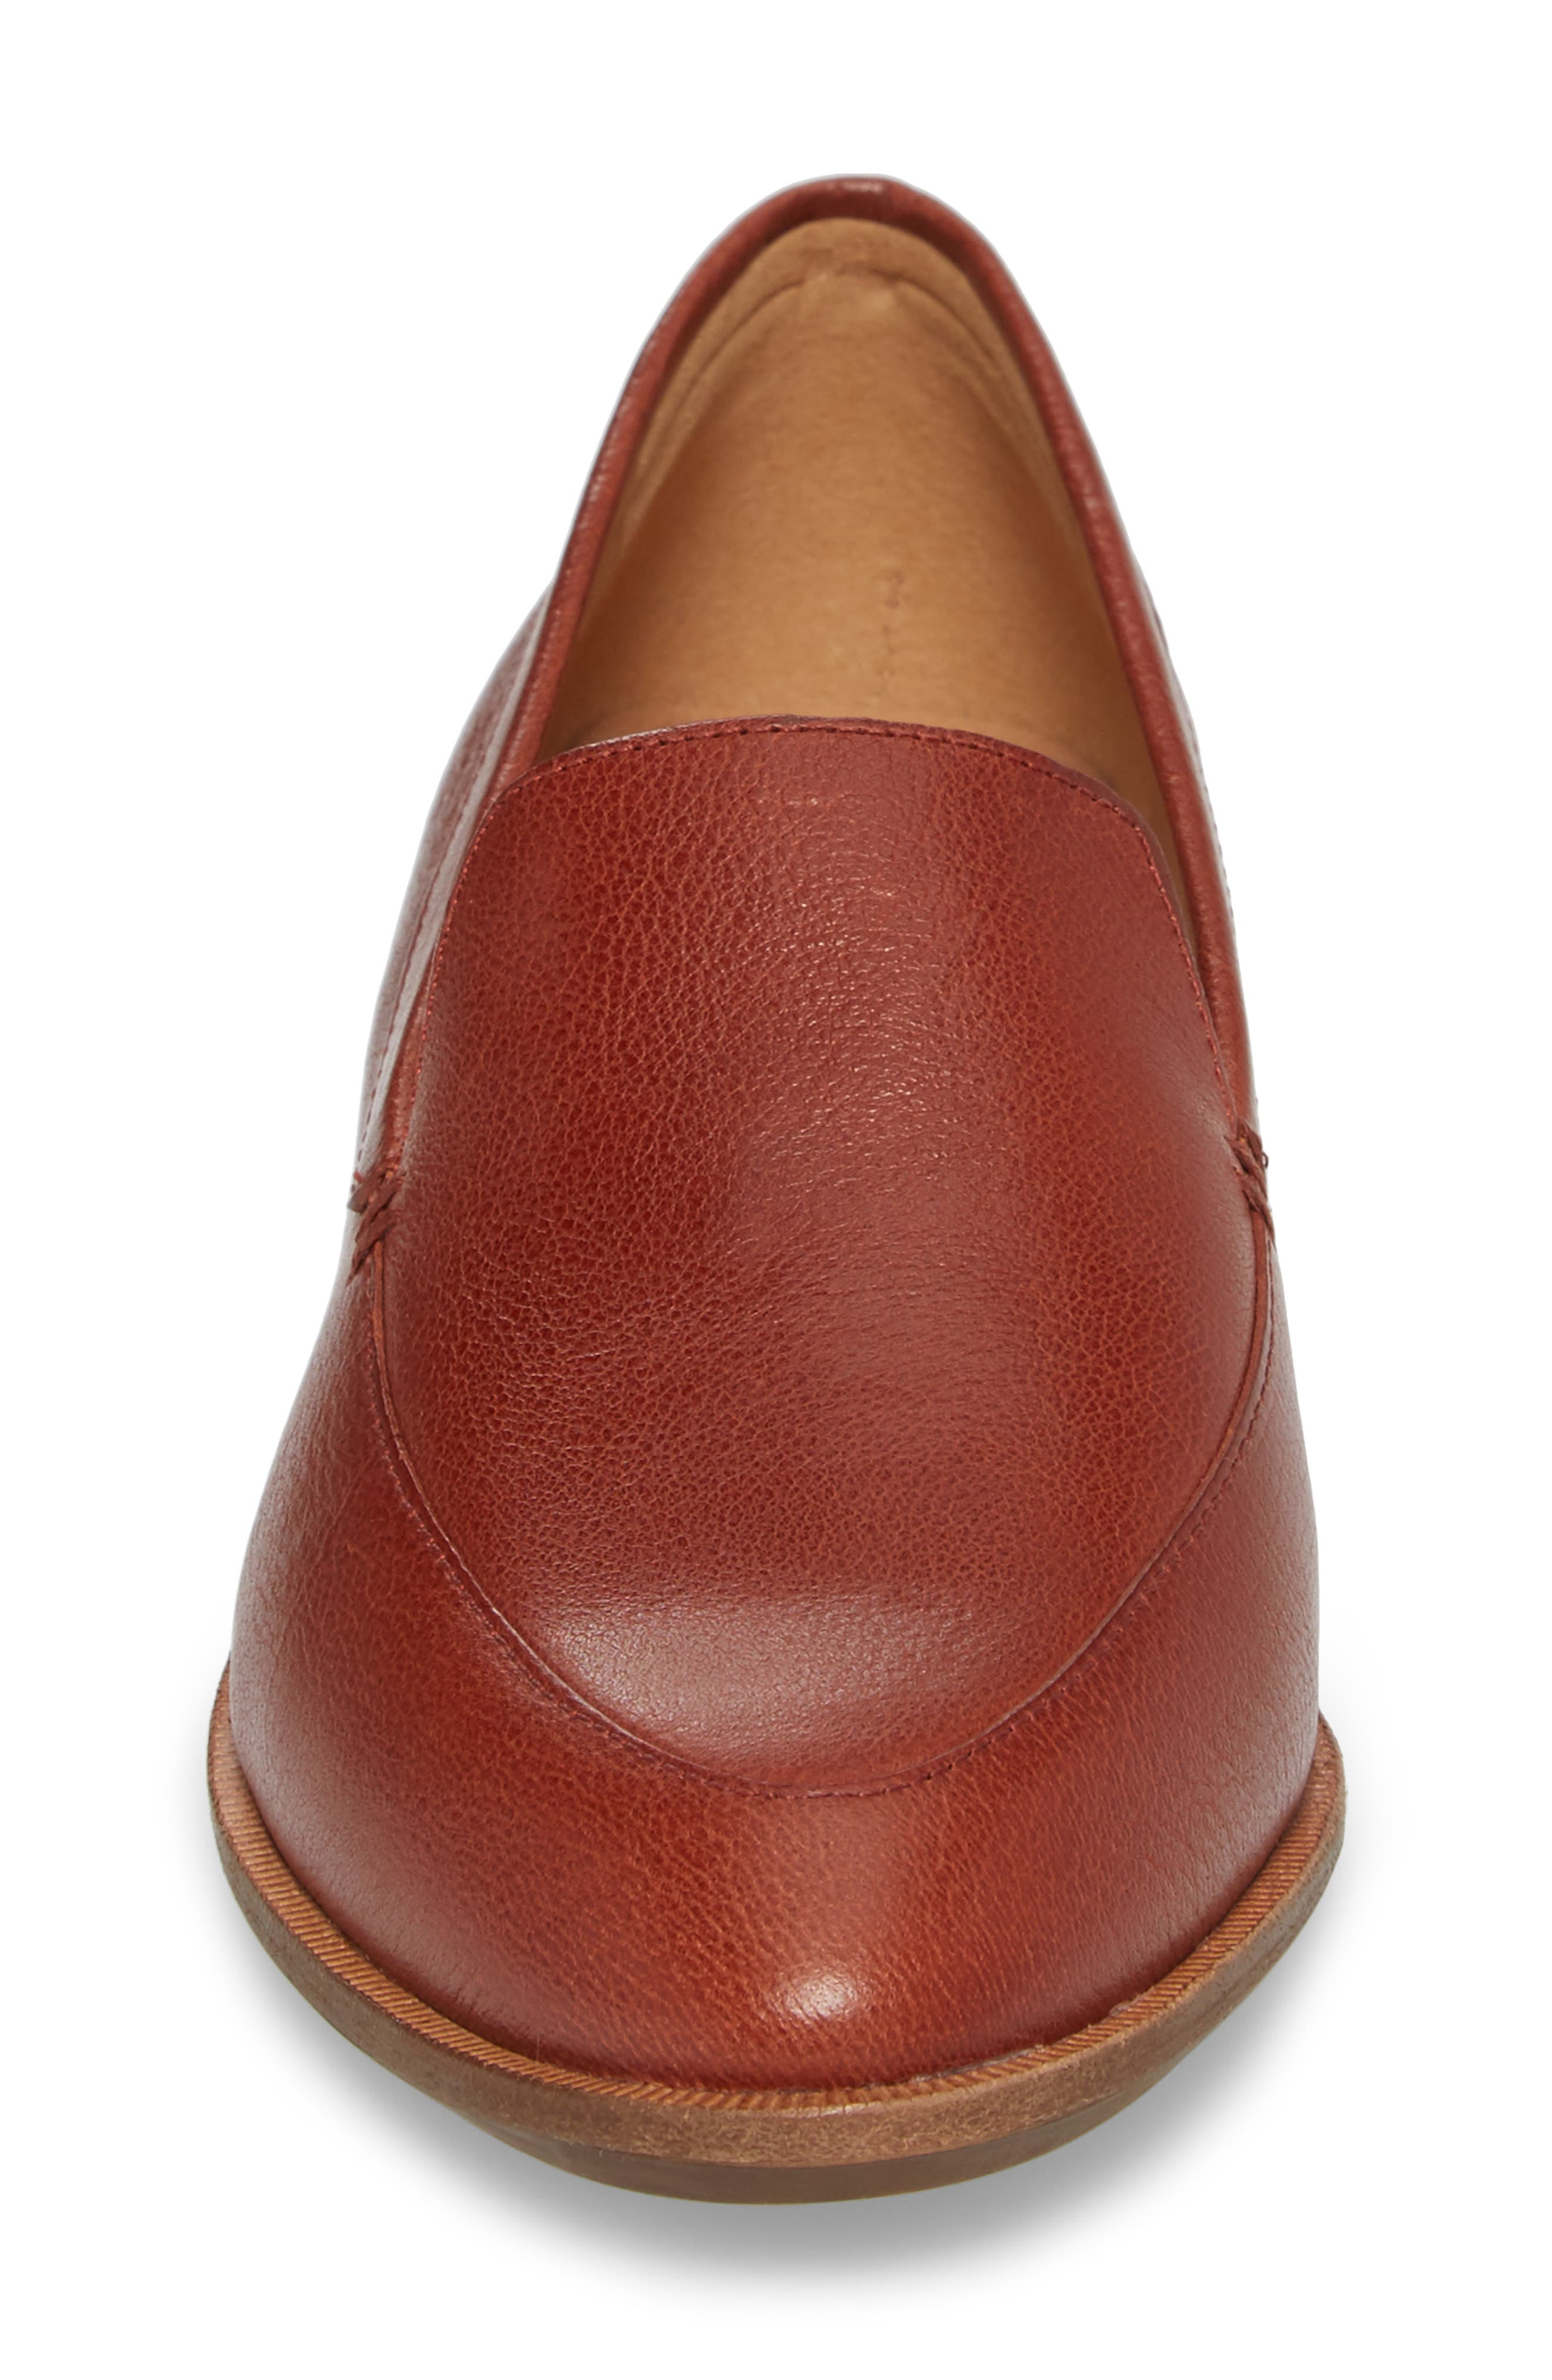 Frances Loafer,                             Alternate thumbnail 4, color,                             Burnished Mahogany Leather